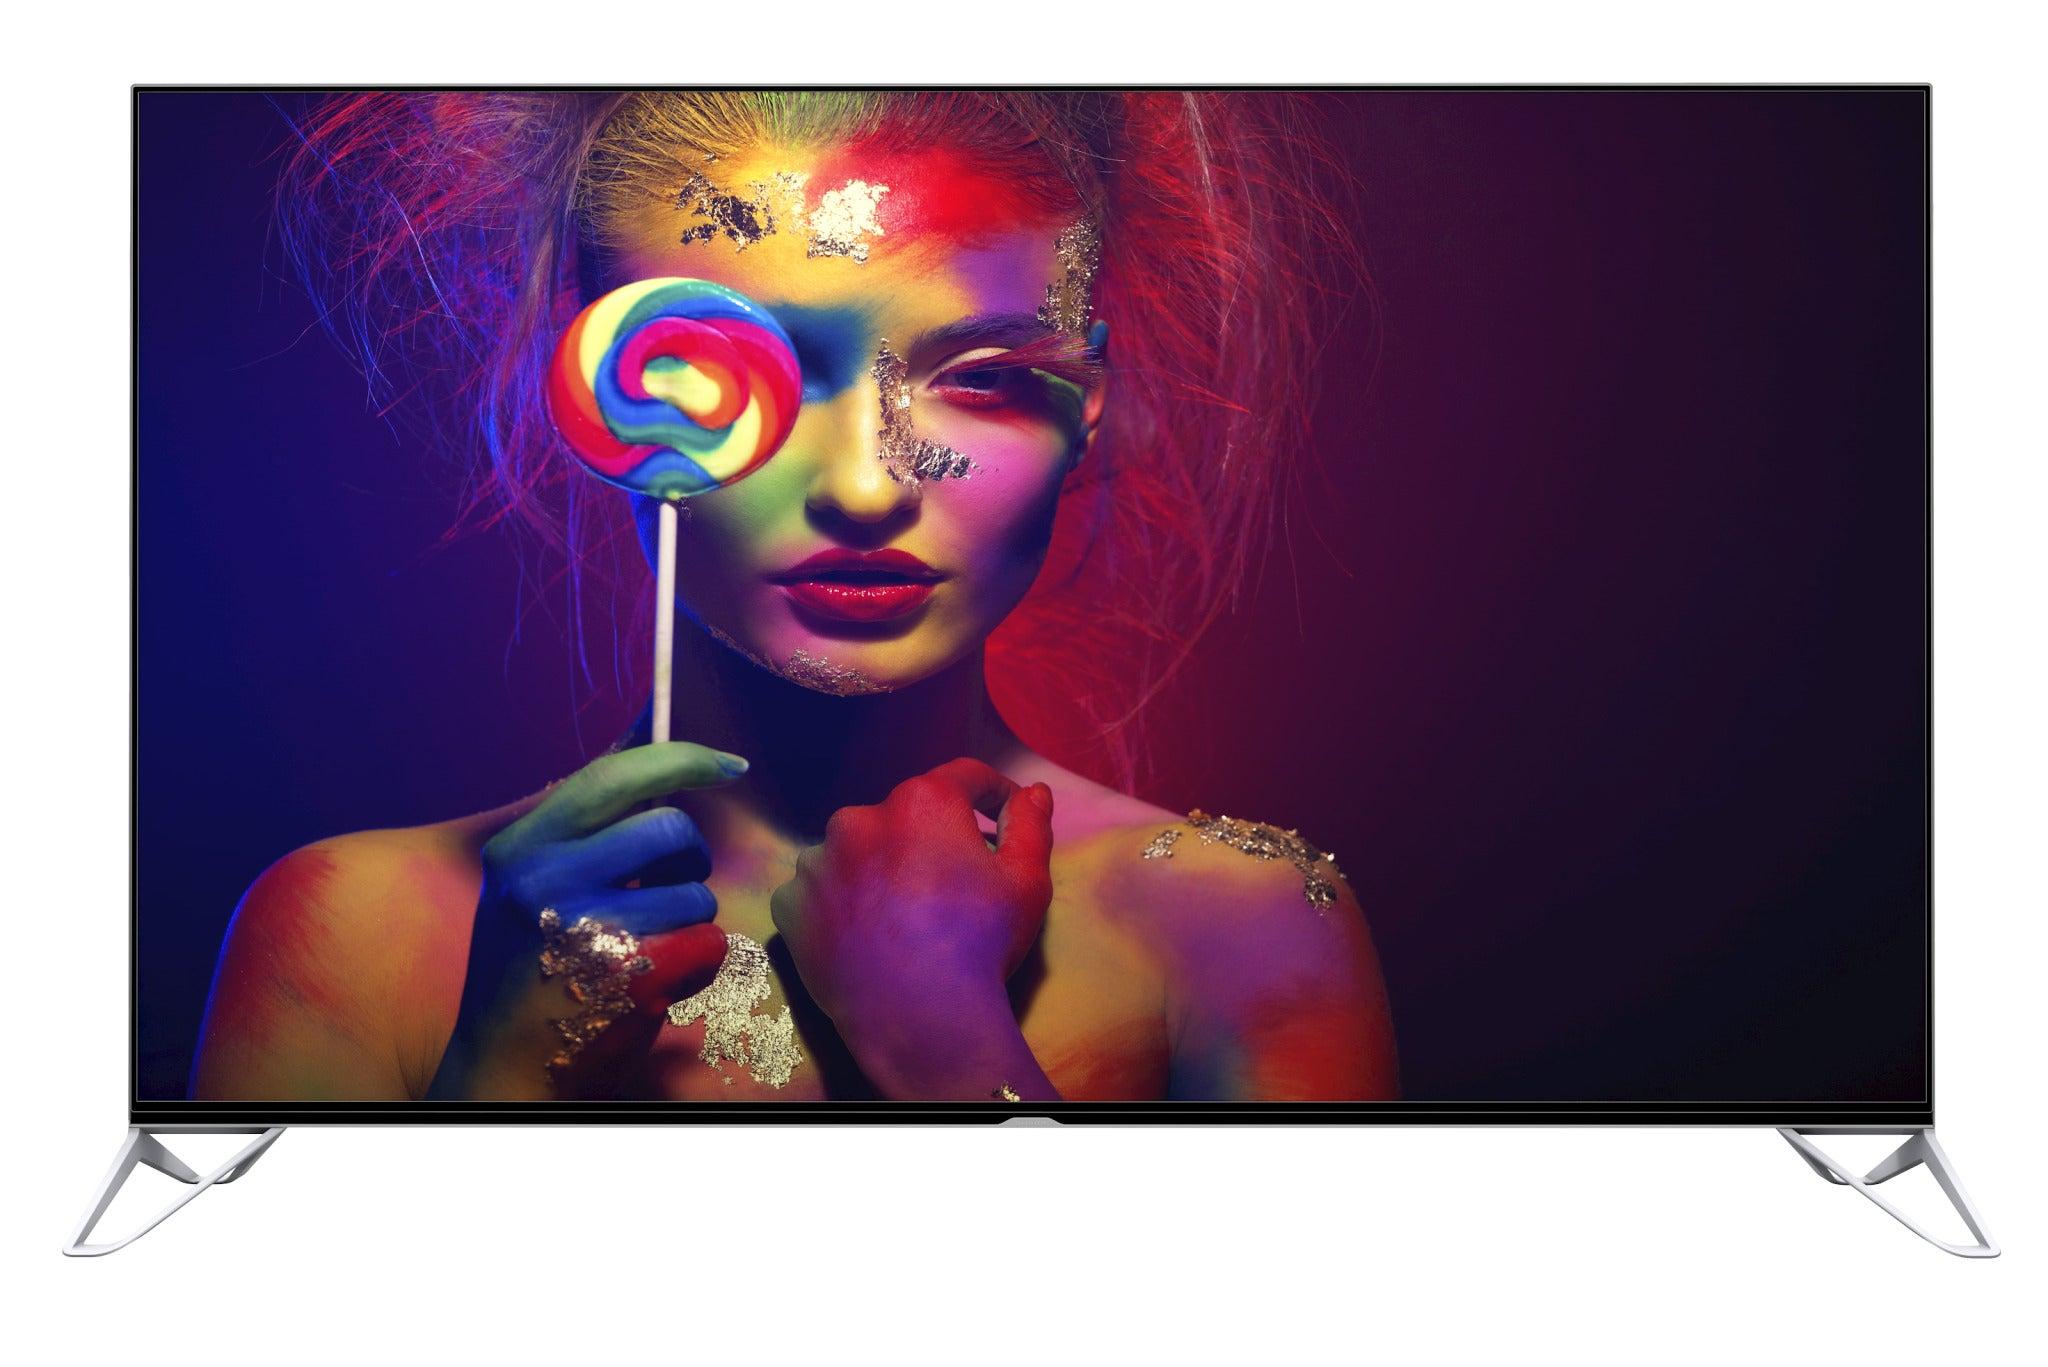 Sharp's 80-Inch Beyond 4K Ultra HD TV Is Overstuffed With Pixels